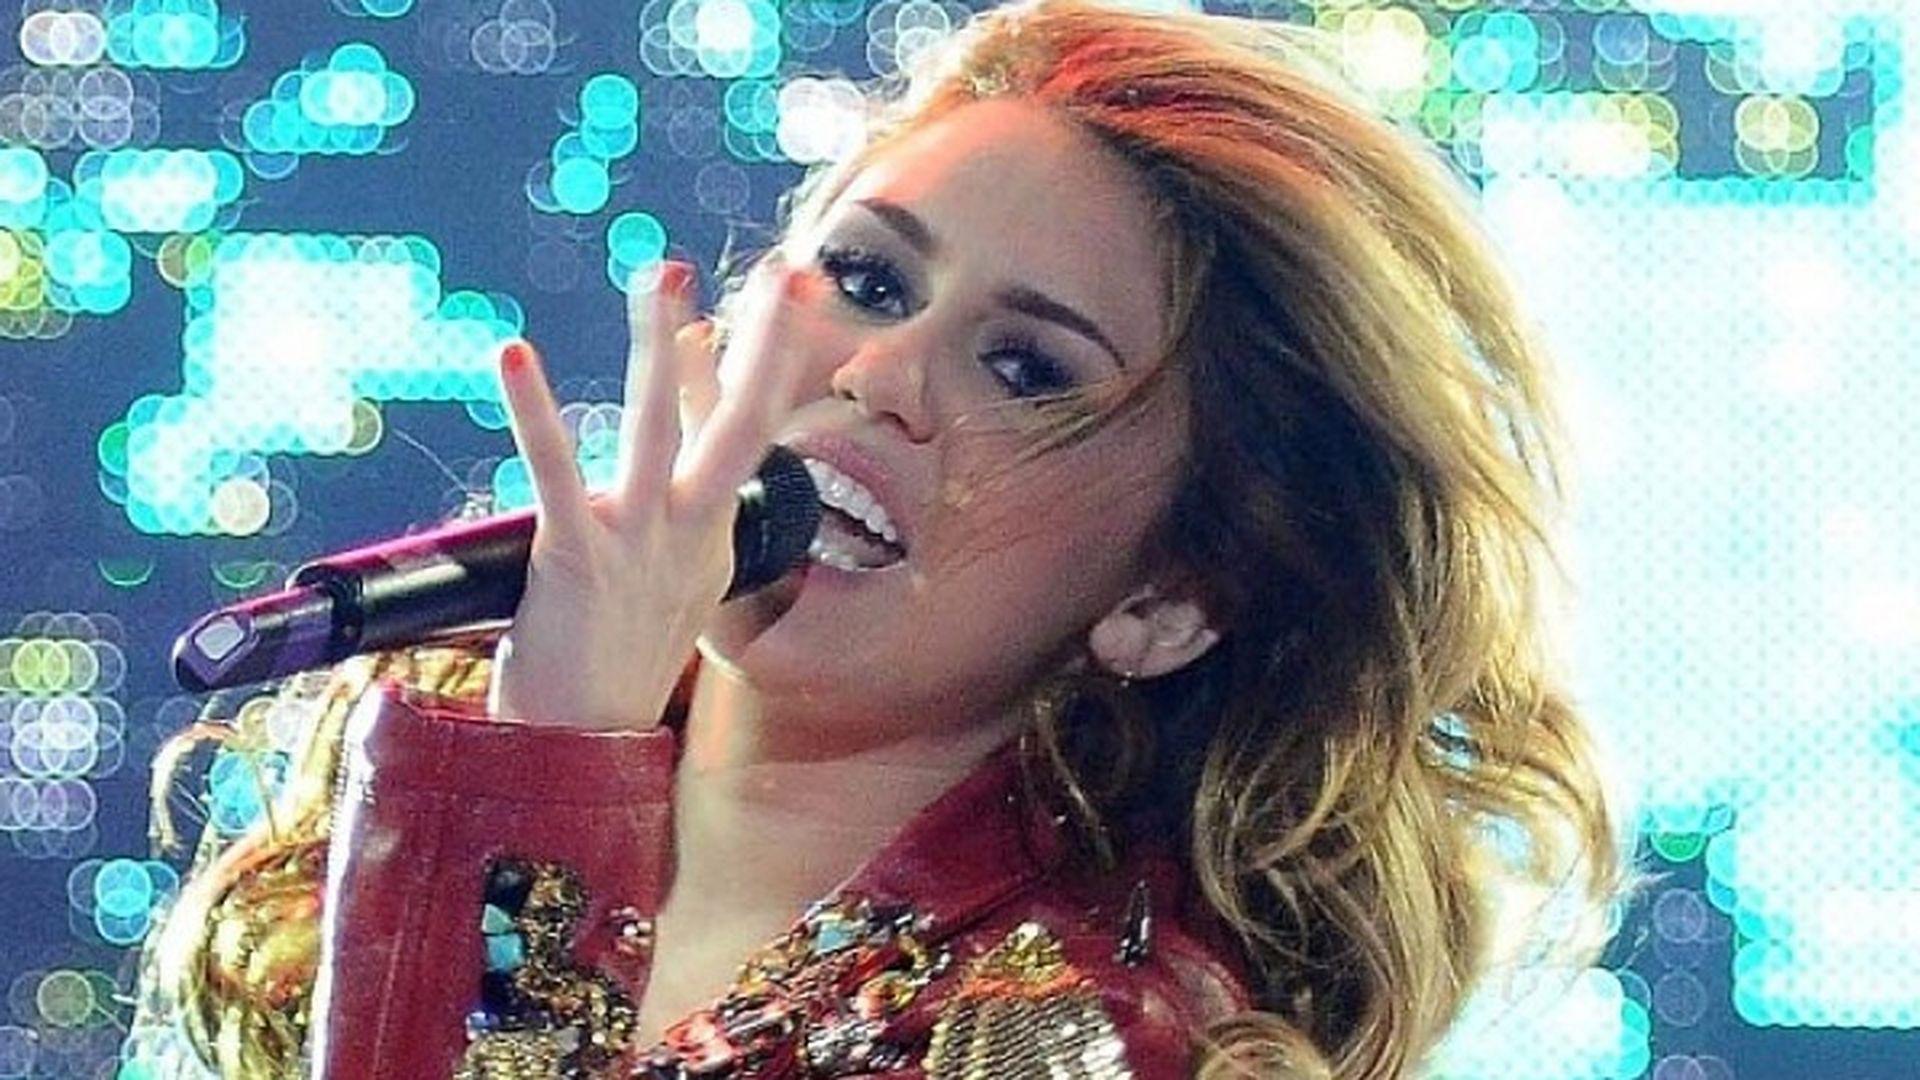 Miley Cyrus Sex Tep - Handy Pornos - NurXXXmobi